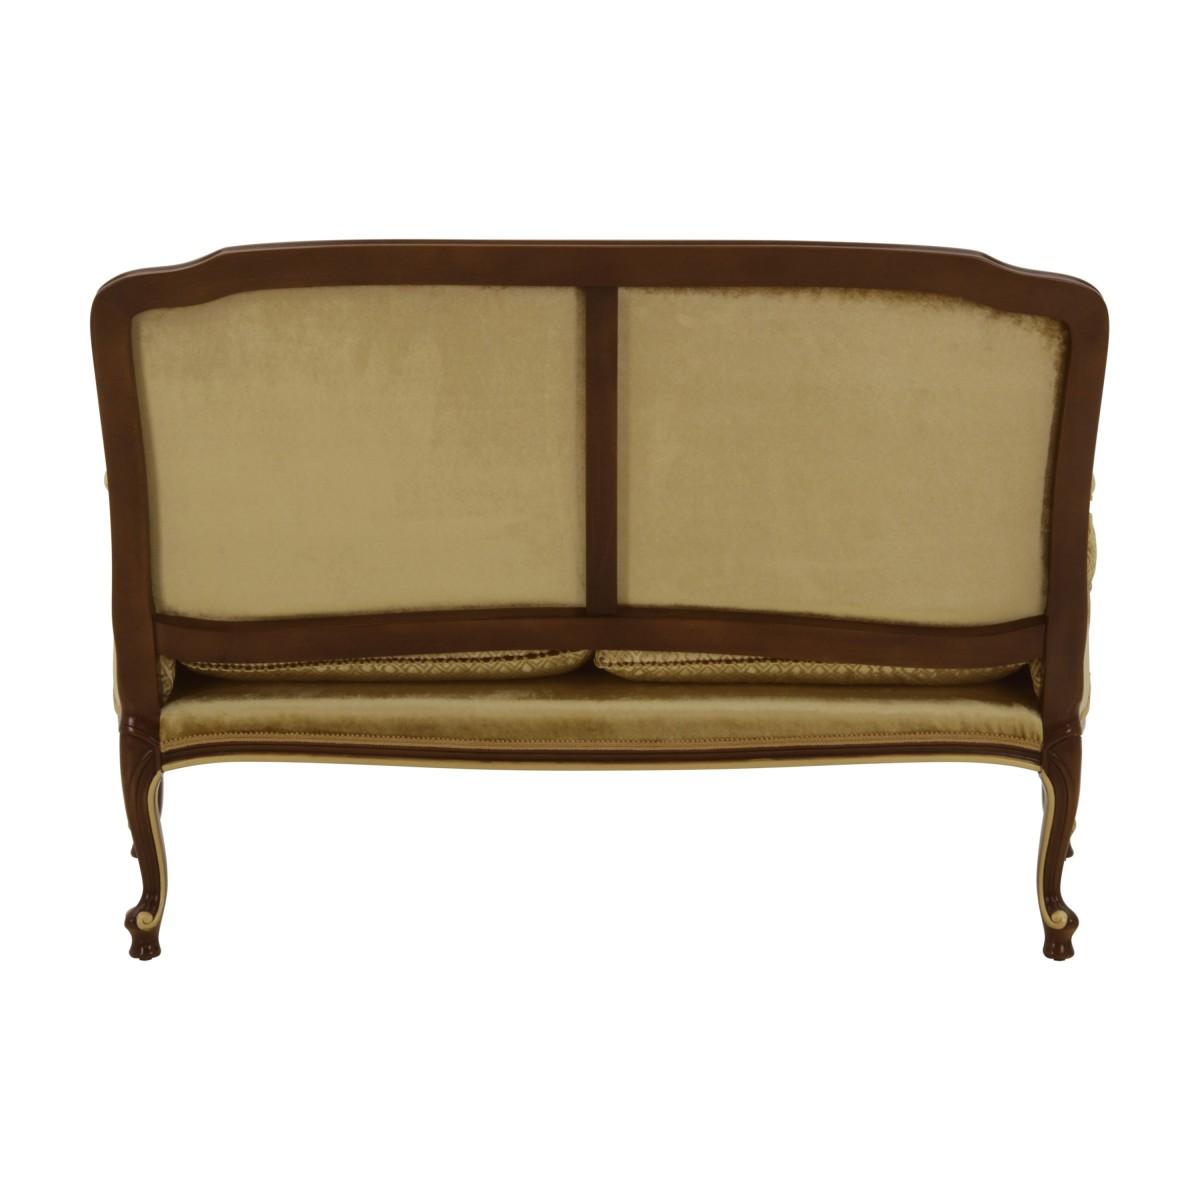 2 Seater sofa Carmen - Sevensedie